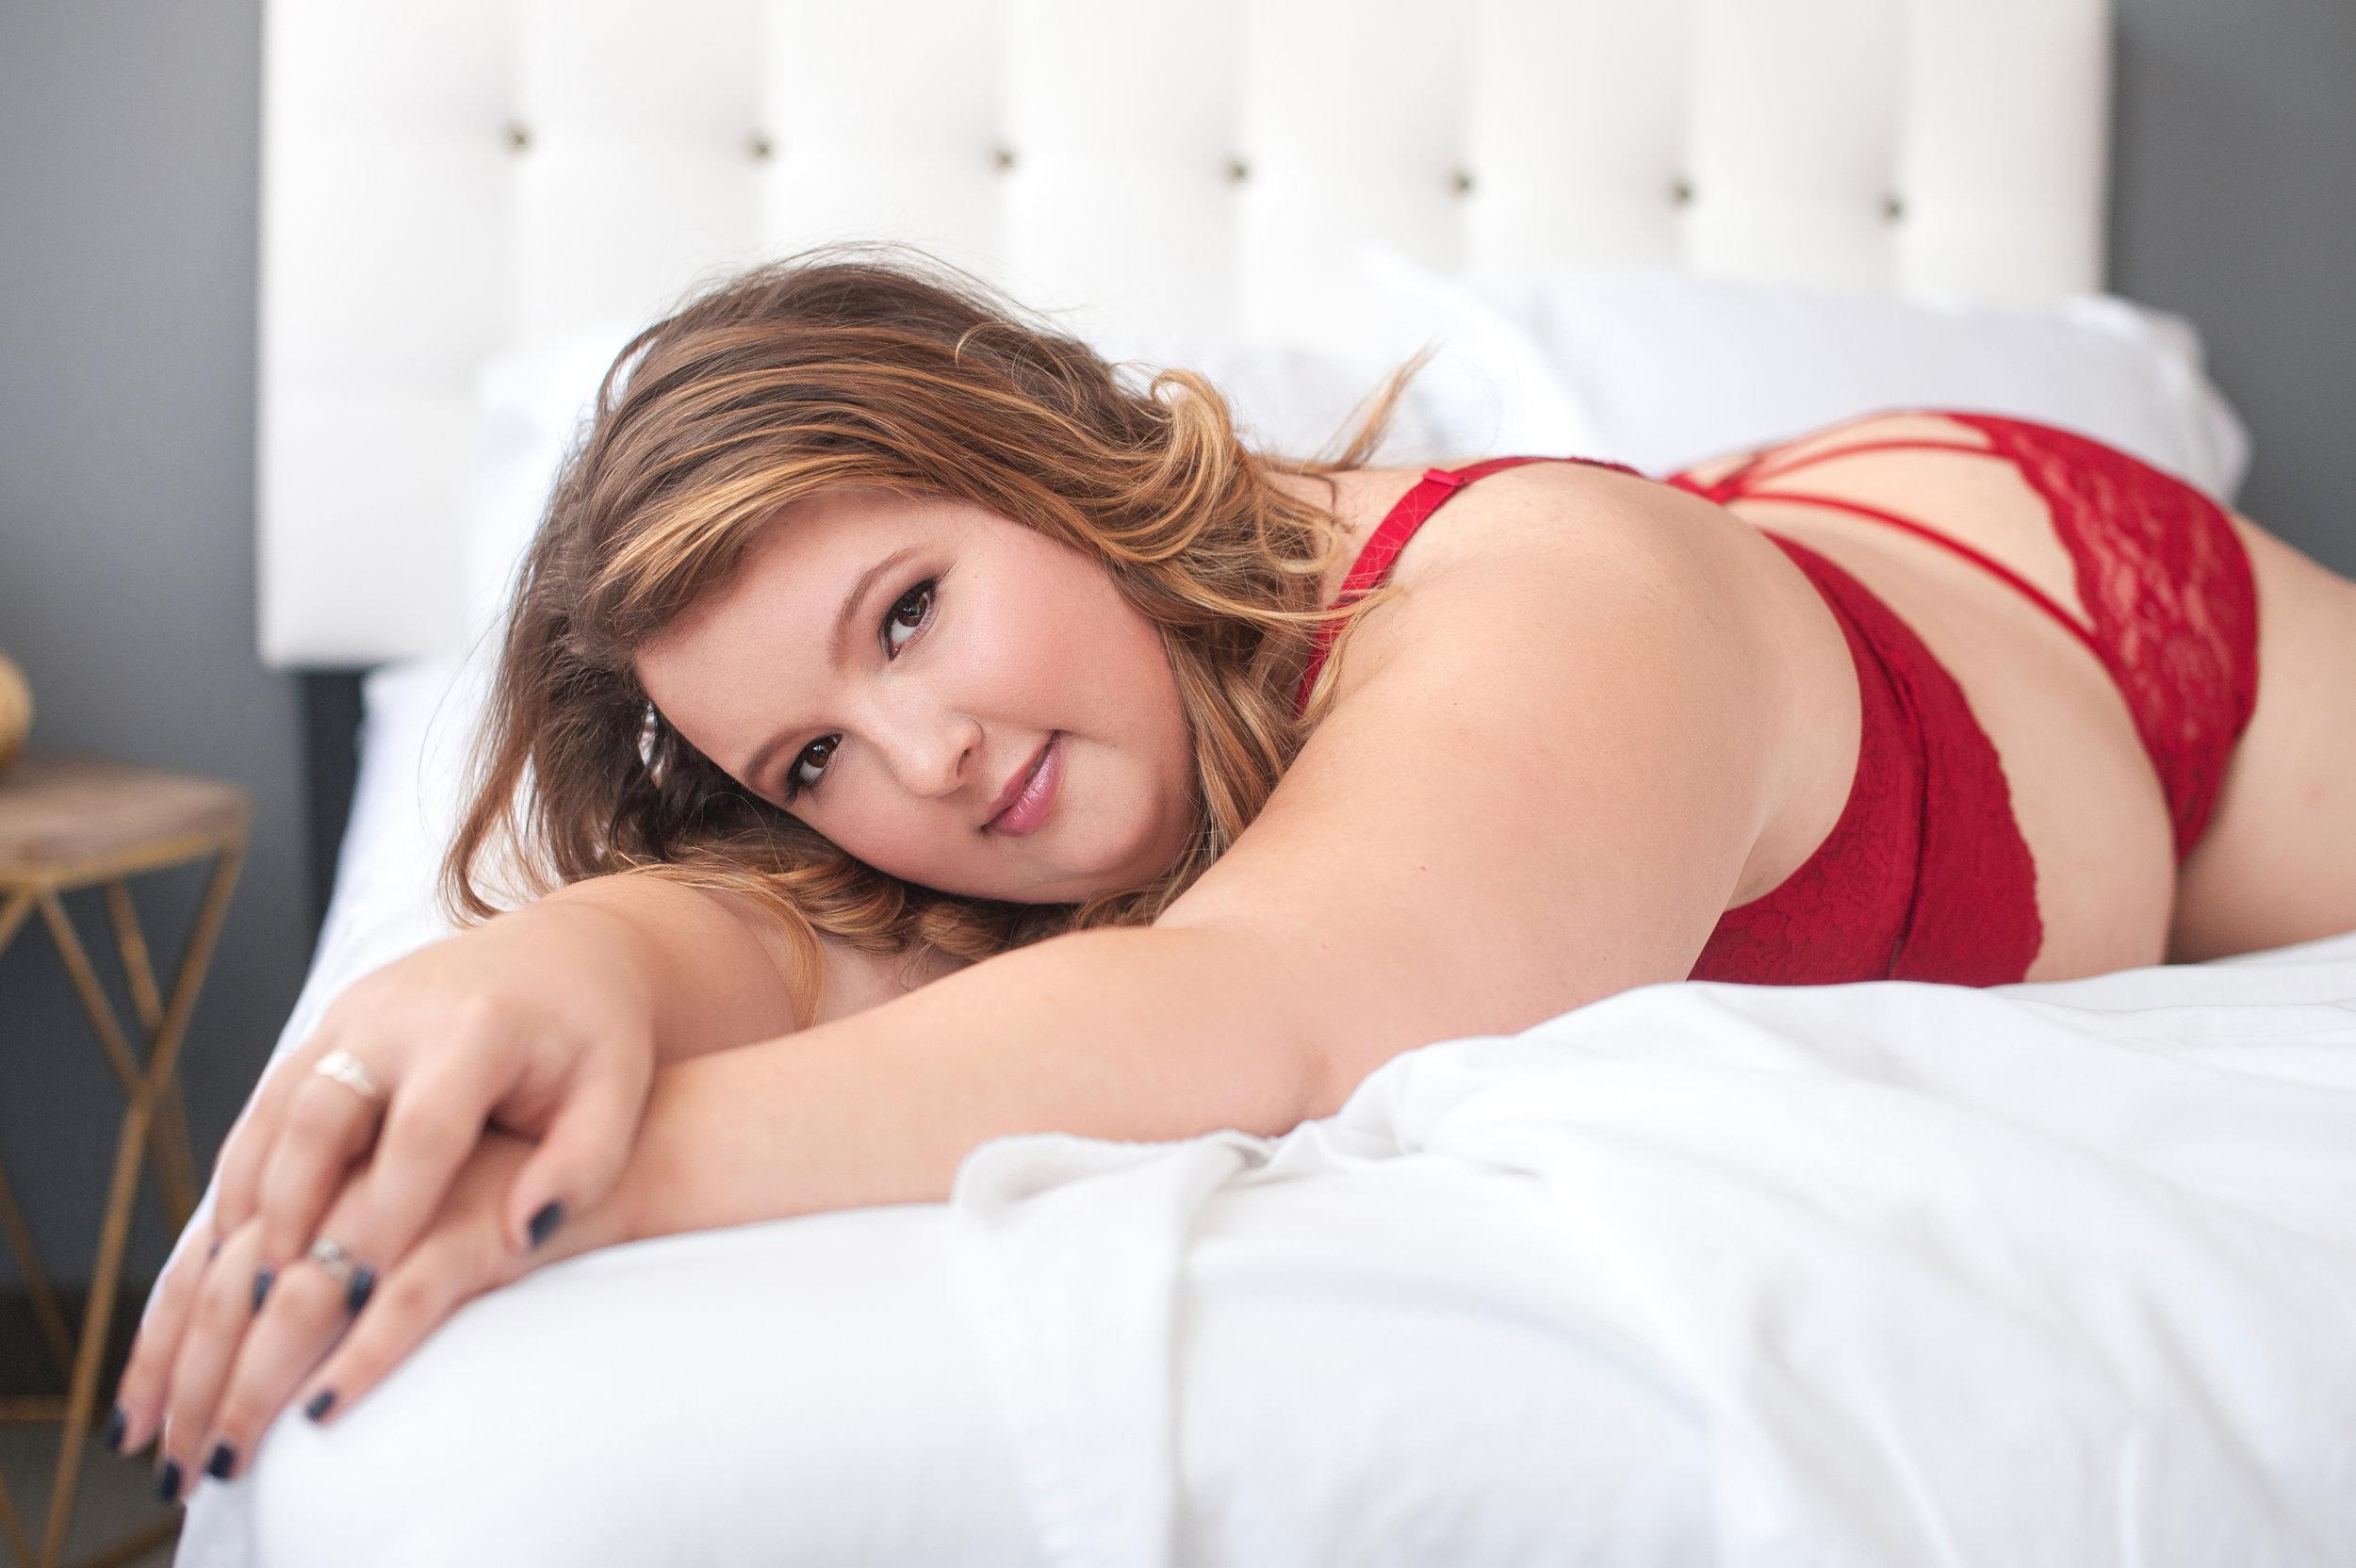 Columbus boudoir photographer, sexy photo shoot, lingerie pictures, sexy pics, underwear model columbus, beauty and boudoir, sultry photos